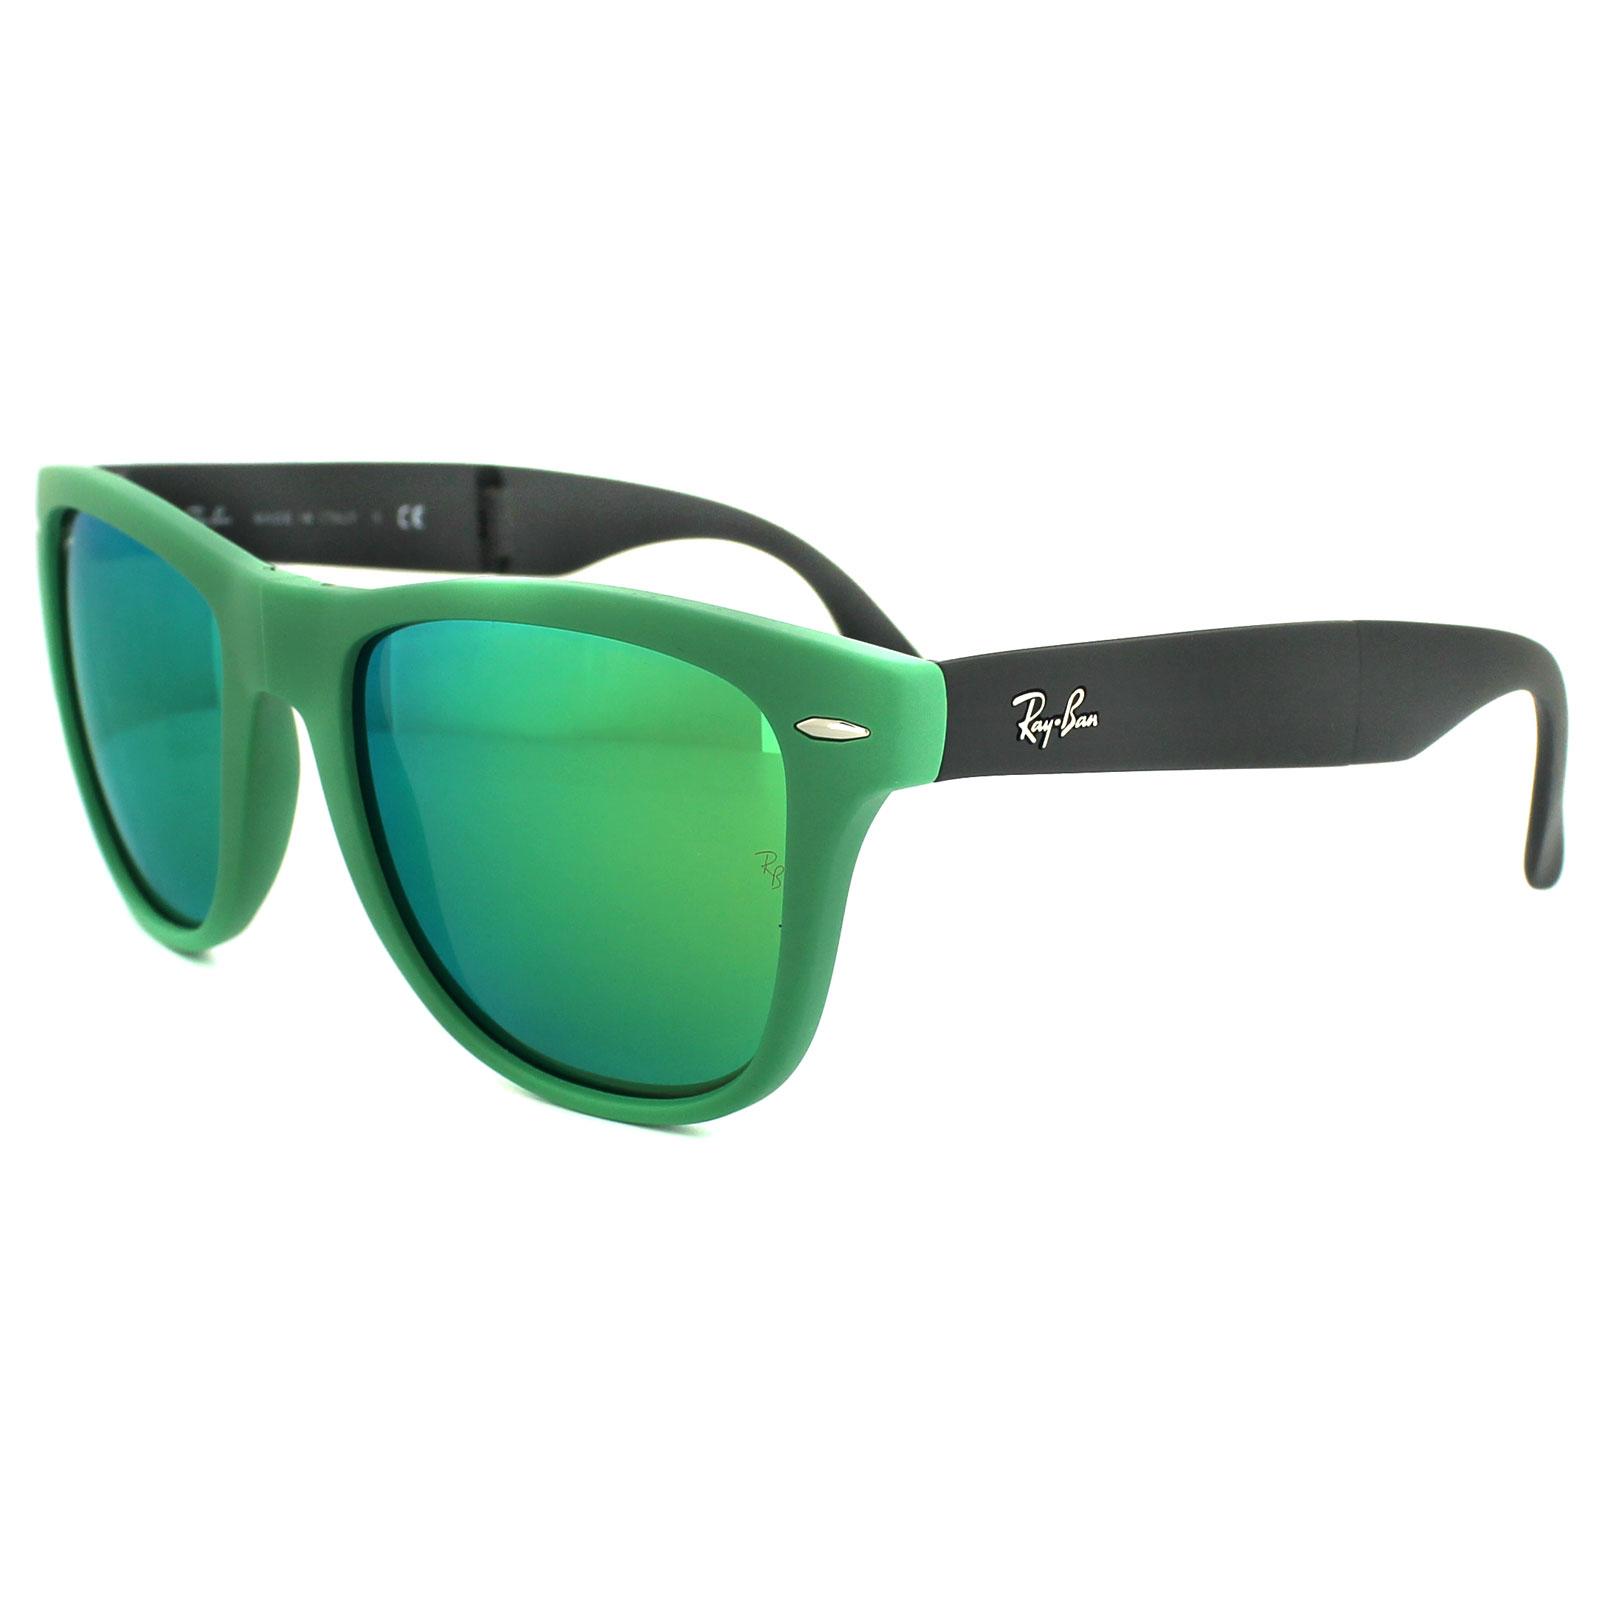 Cheap Ray Ban Sunglasses Folding Wayfarer 4105 602119 Matt